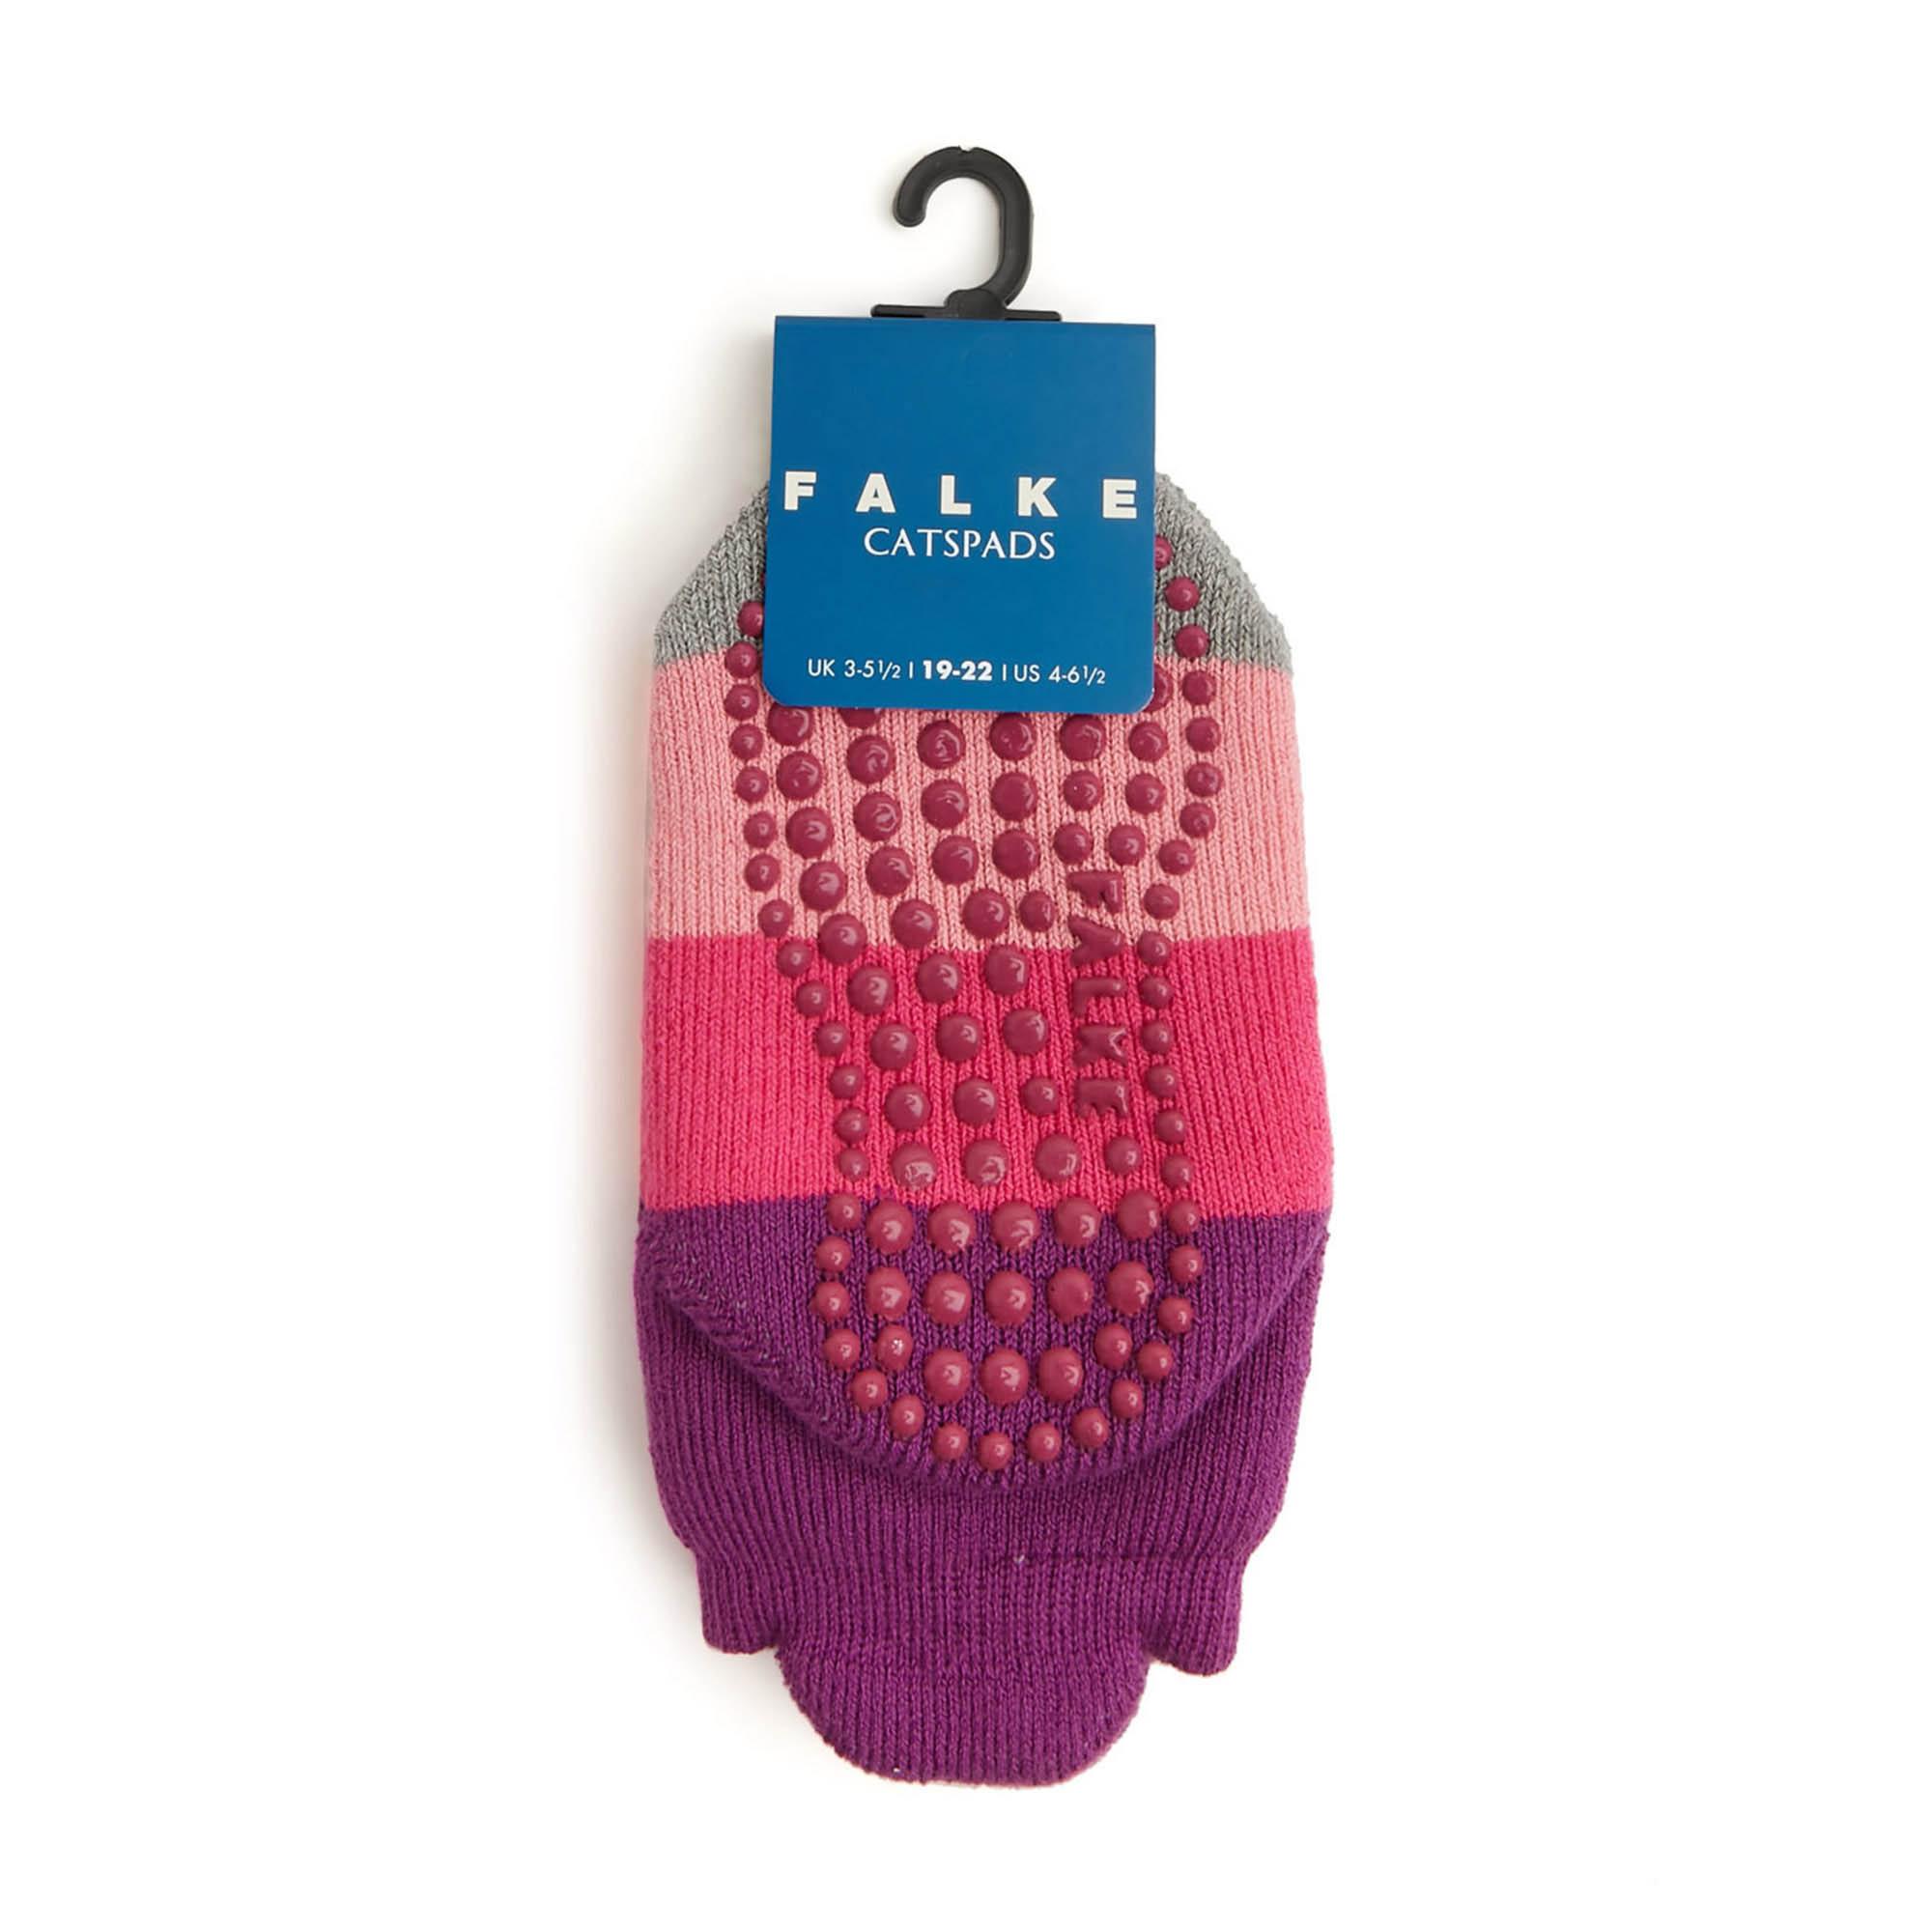 Colour Block kids non-slip socks